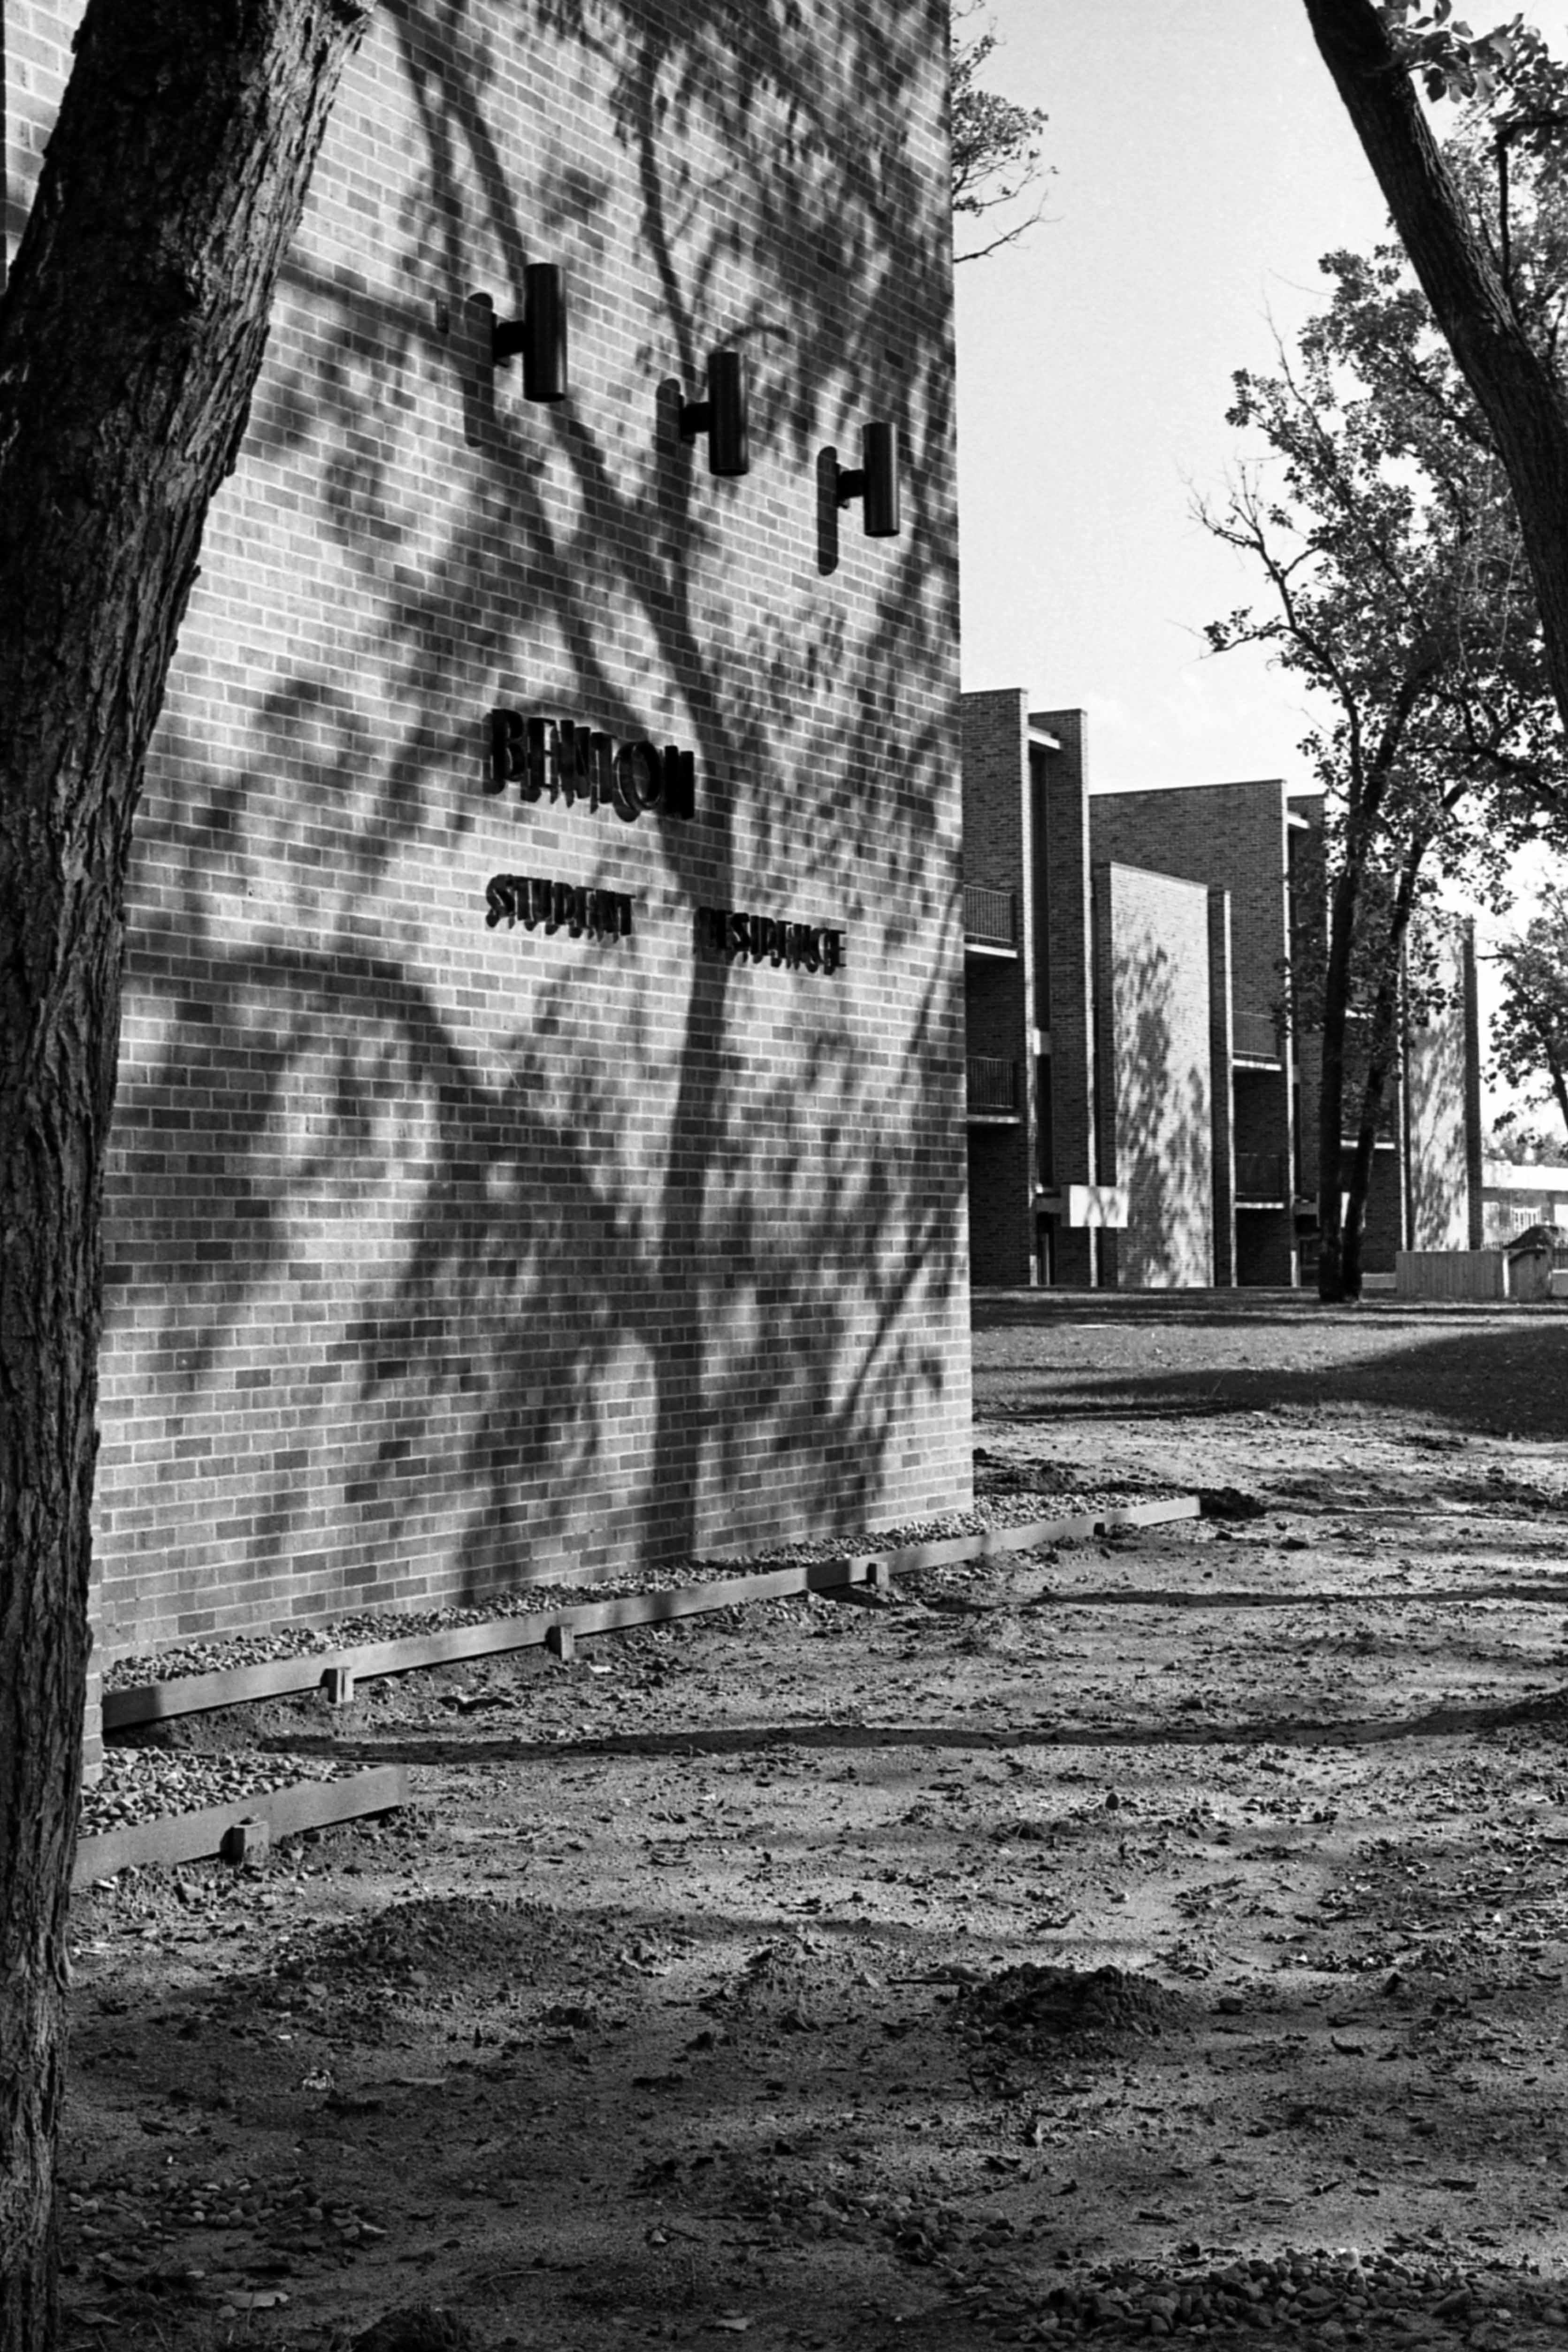 Benton Hall, 1968